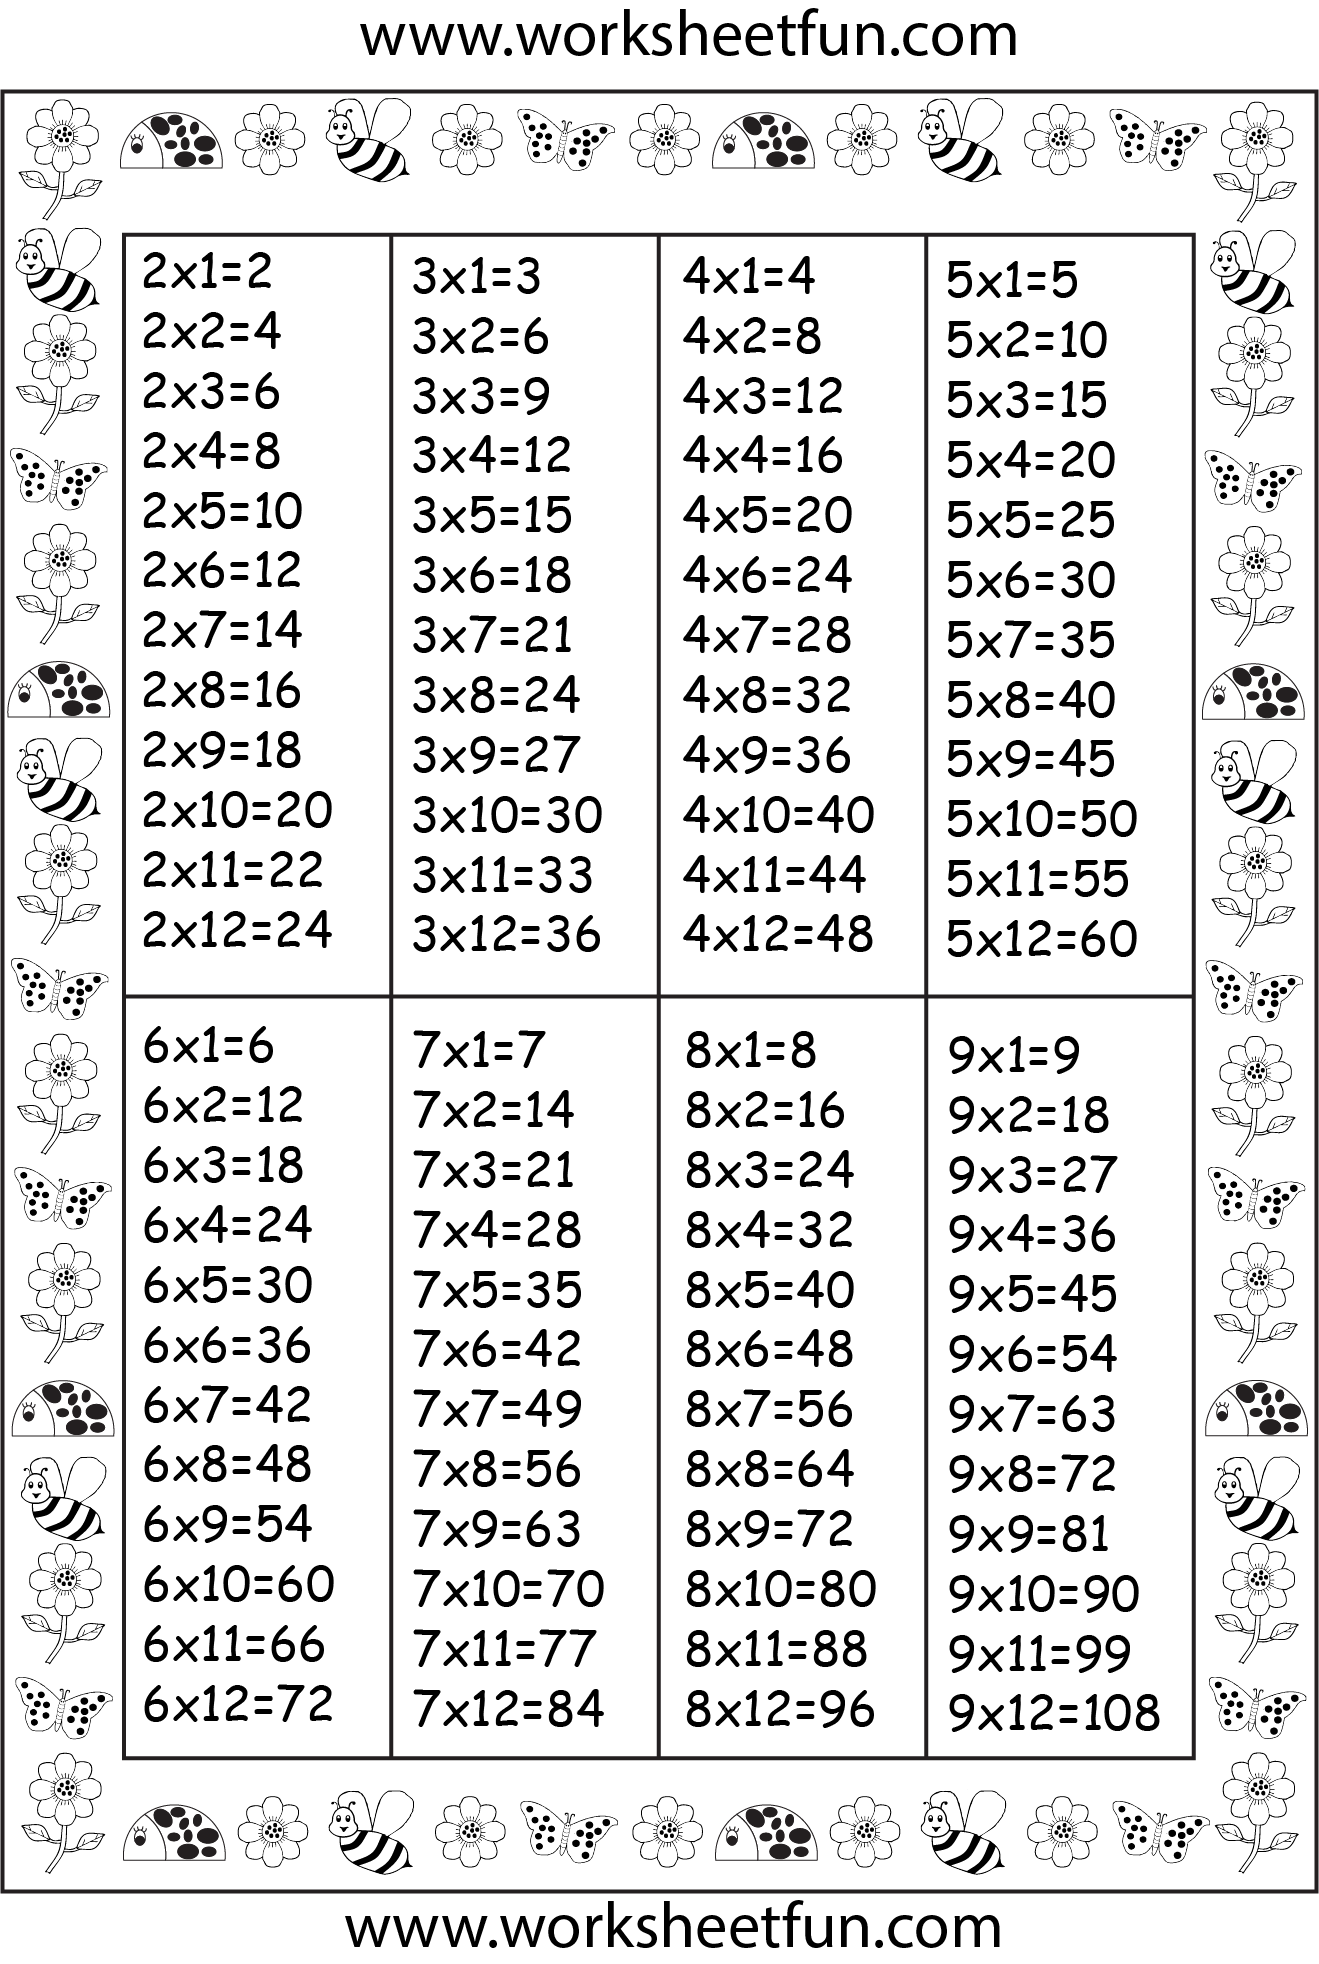 Times Table Chart | Times Table Chart, Homeschool Math